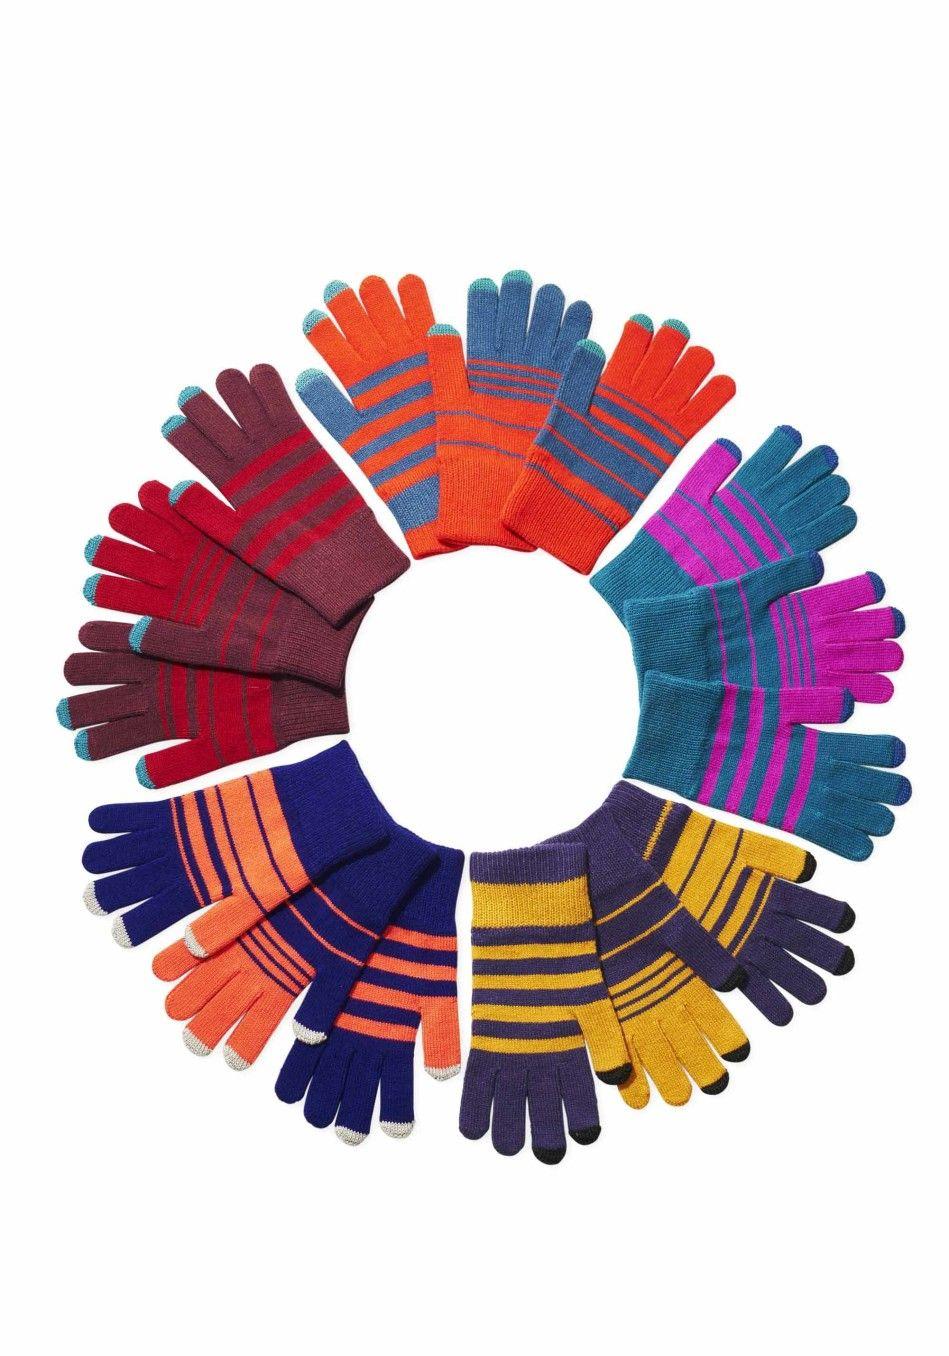 Trio Gloves | Oprahs favorite things 2016, Poinsettia ...